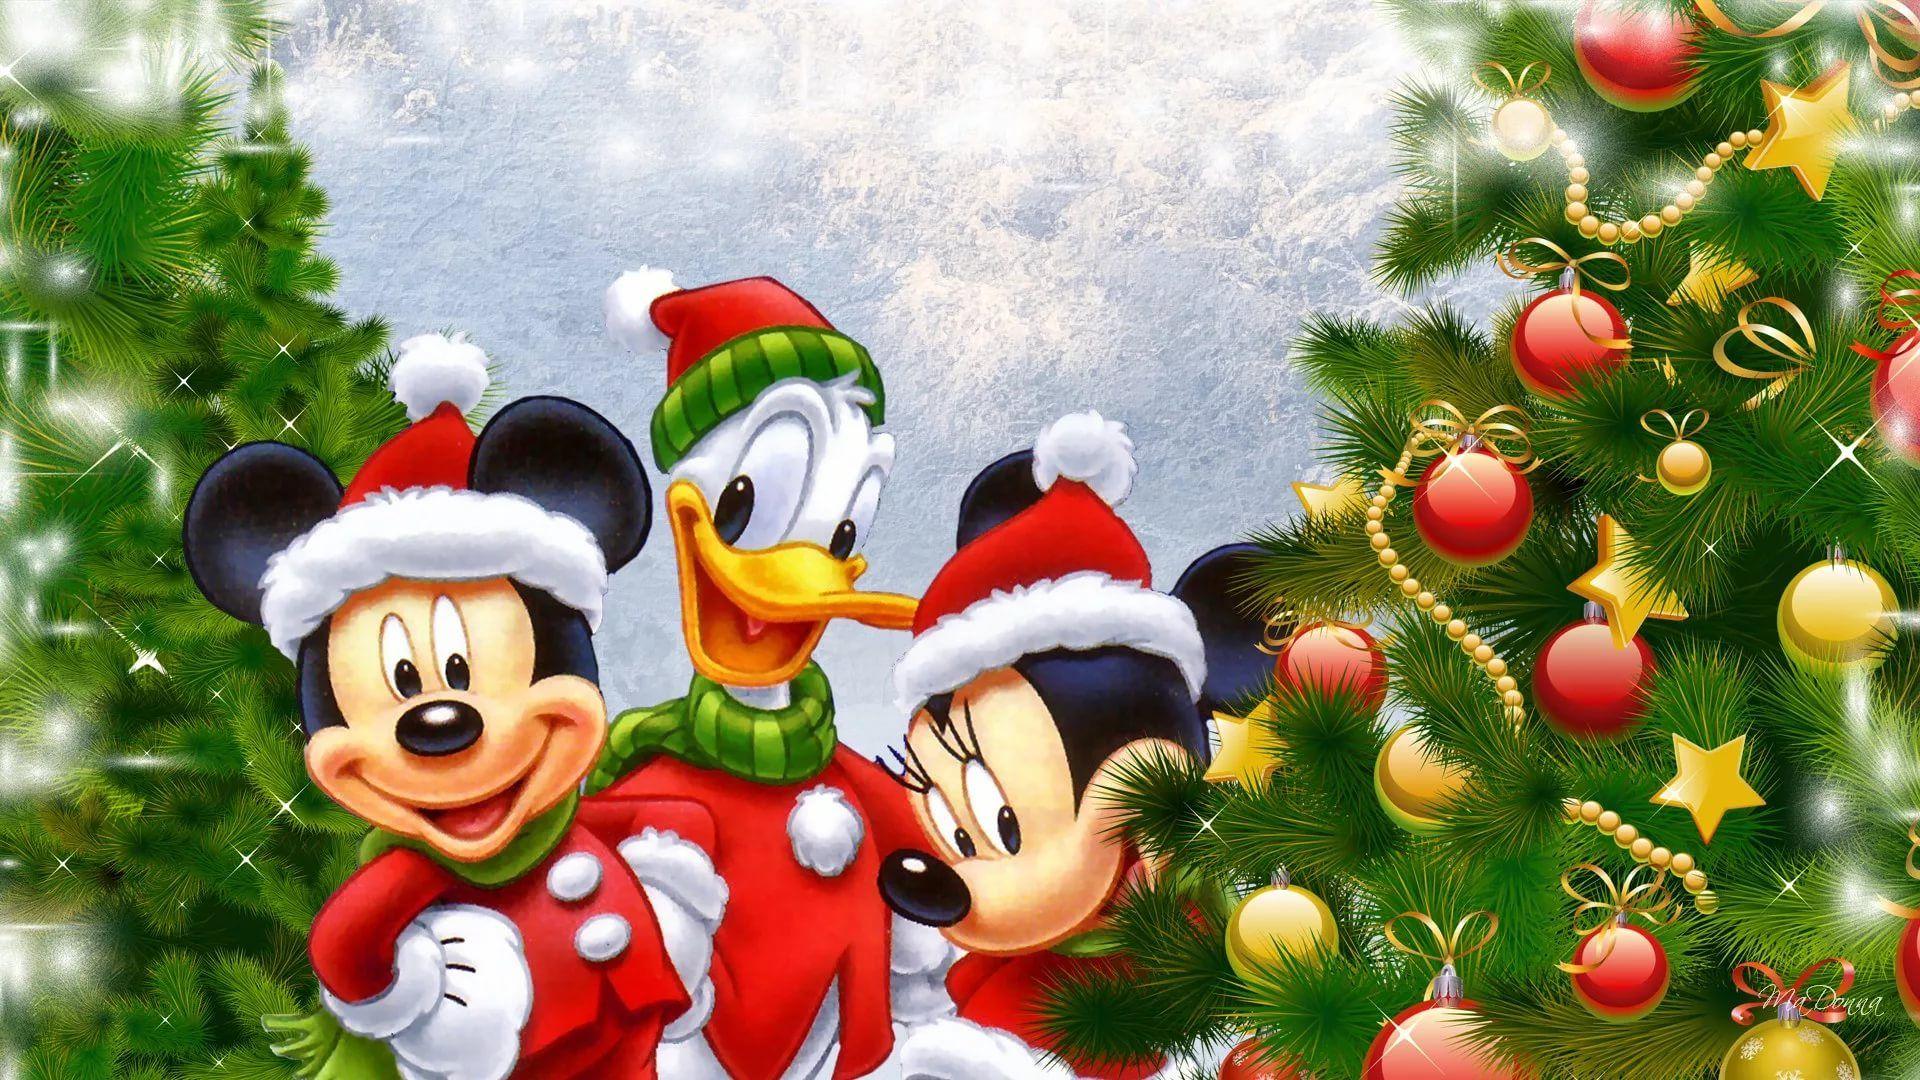 Disney Christmas hd wallpaper 1080